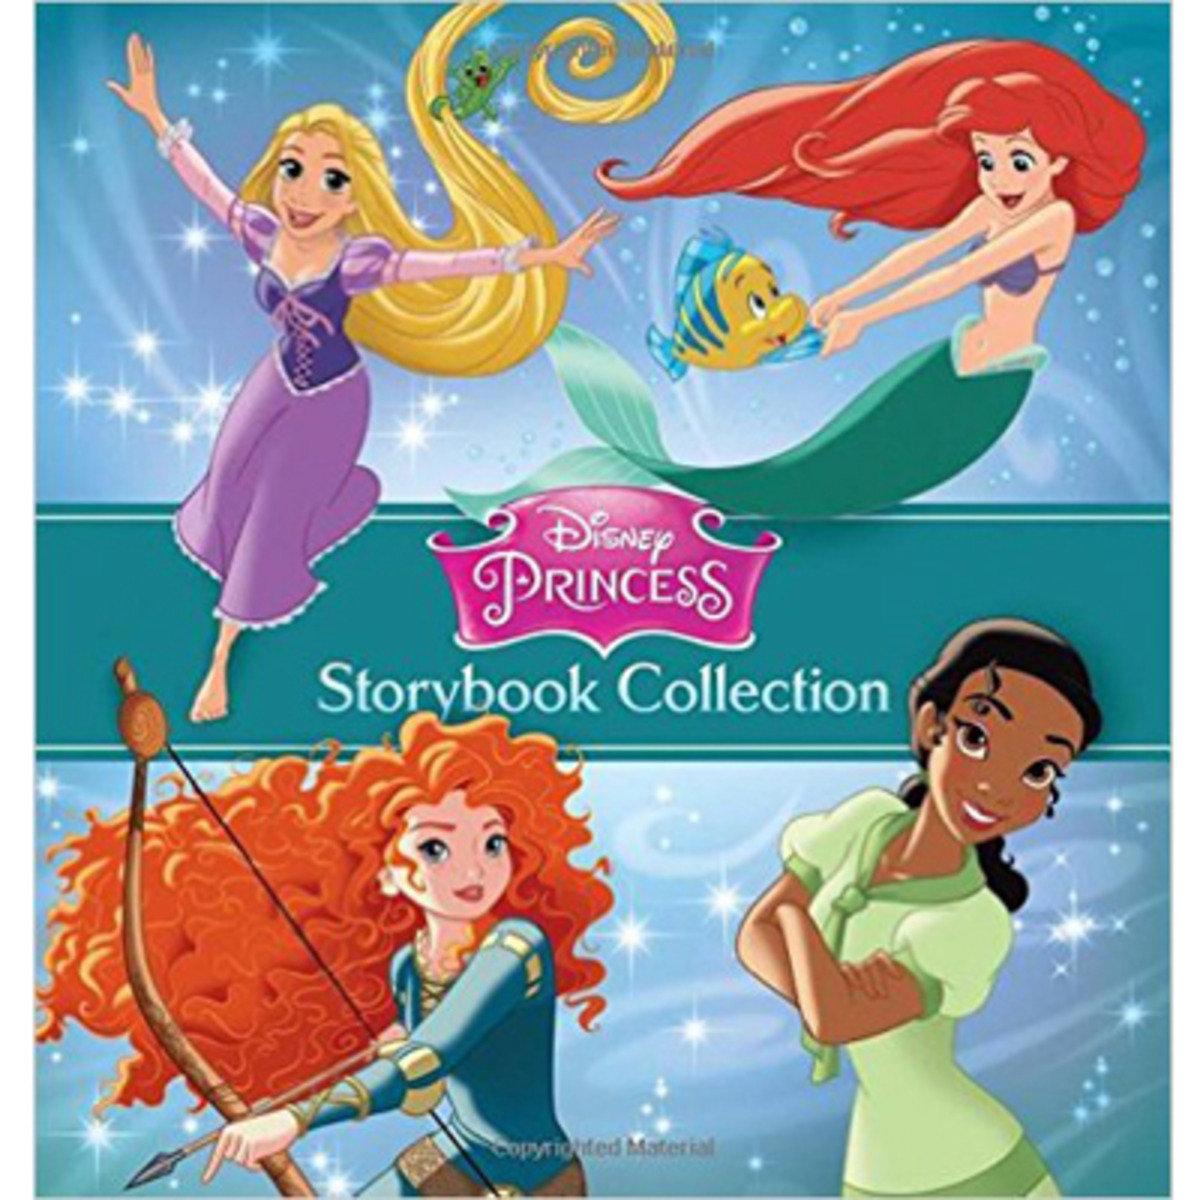 DISNEY PRINCESS STORYBOOK COLLECTION 9781484712832